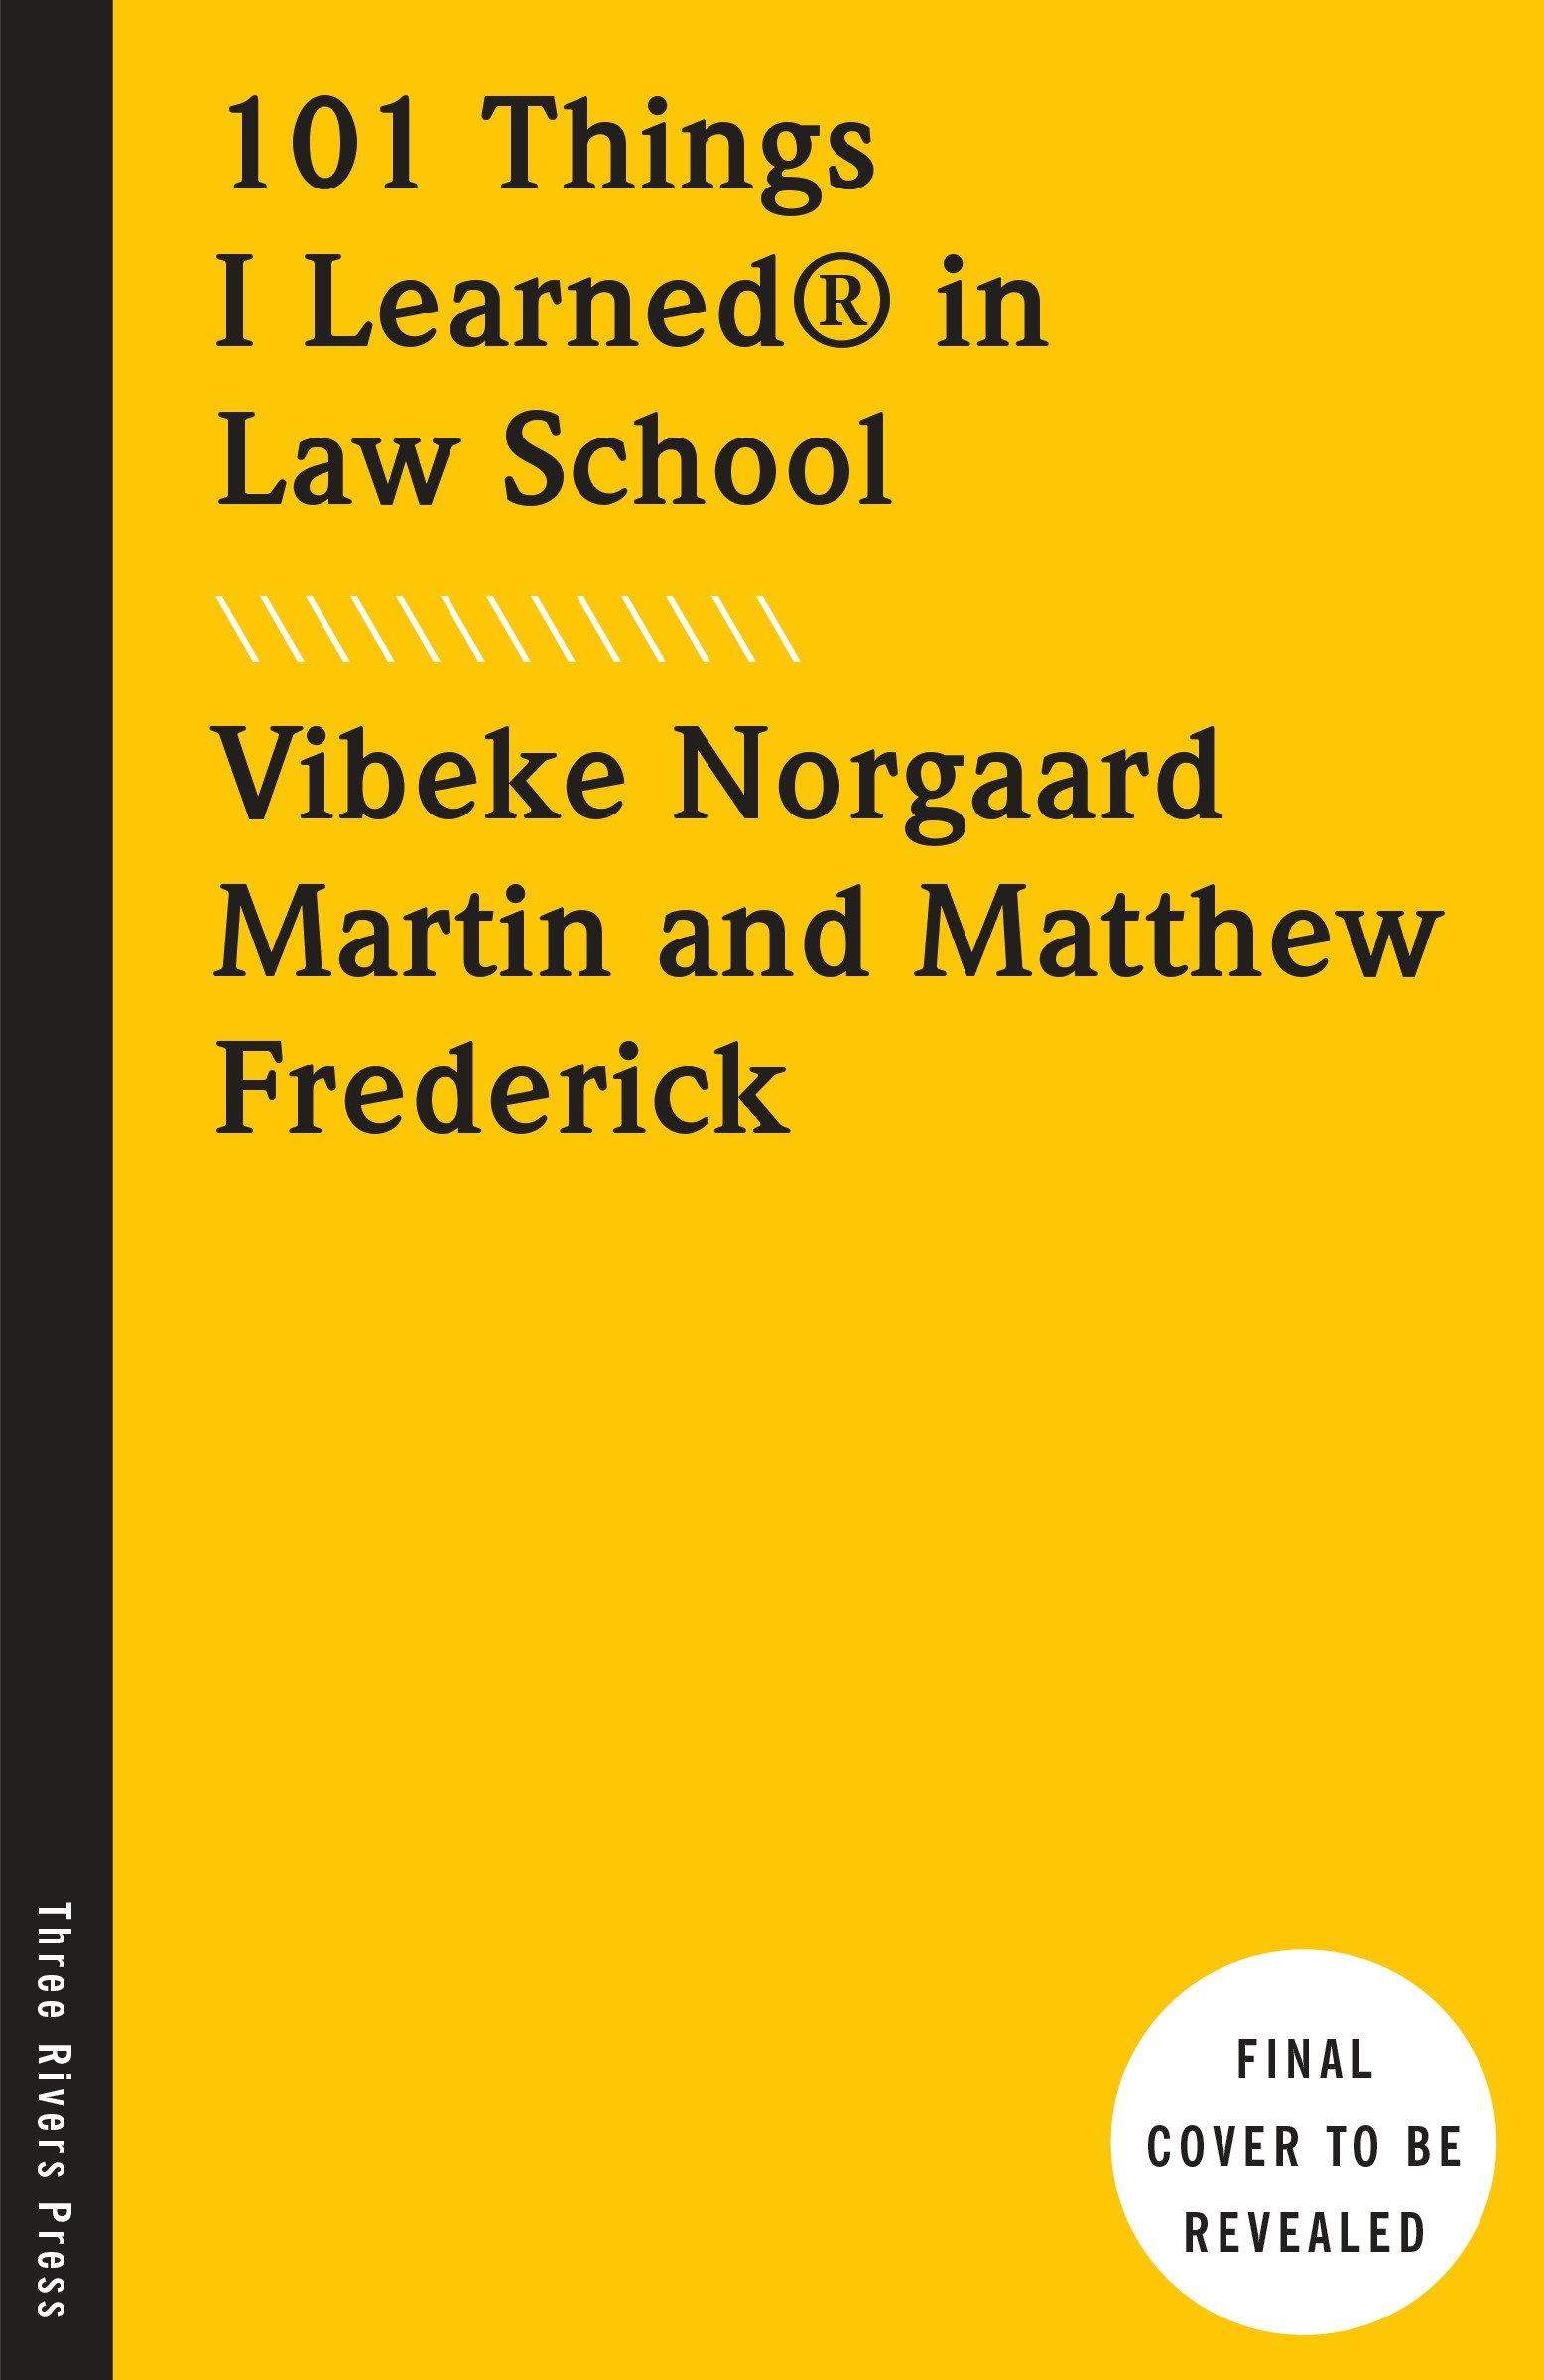 101 Things I Learned in Law School: Vibeke Norgaard Martin, Matthew  Frederick: 9781524762025: Amazon.com: Books